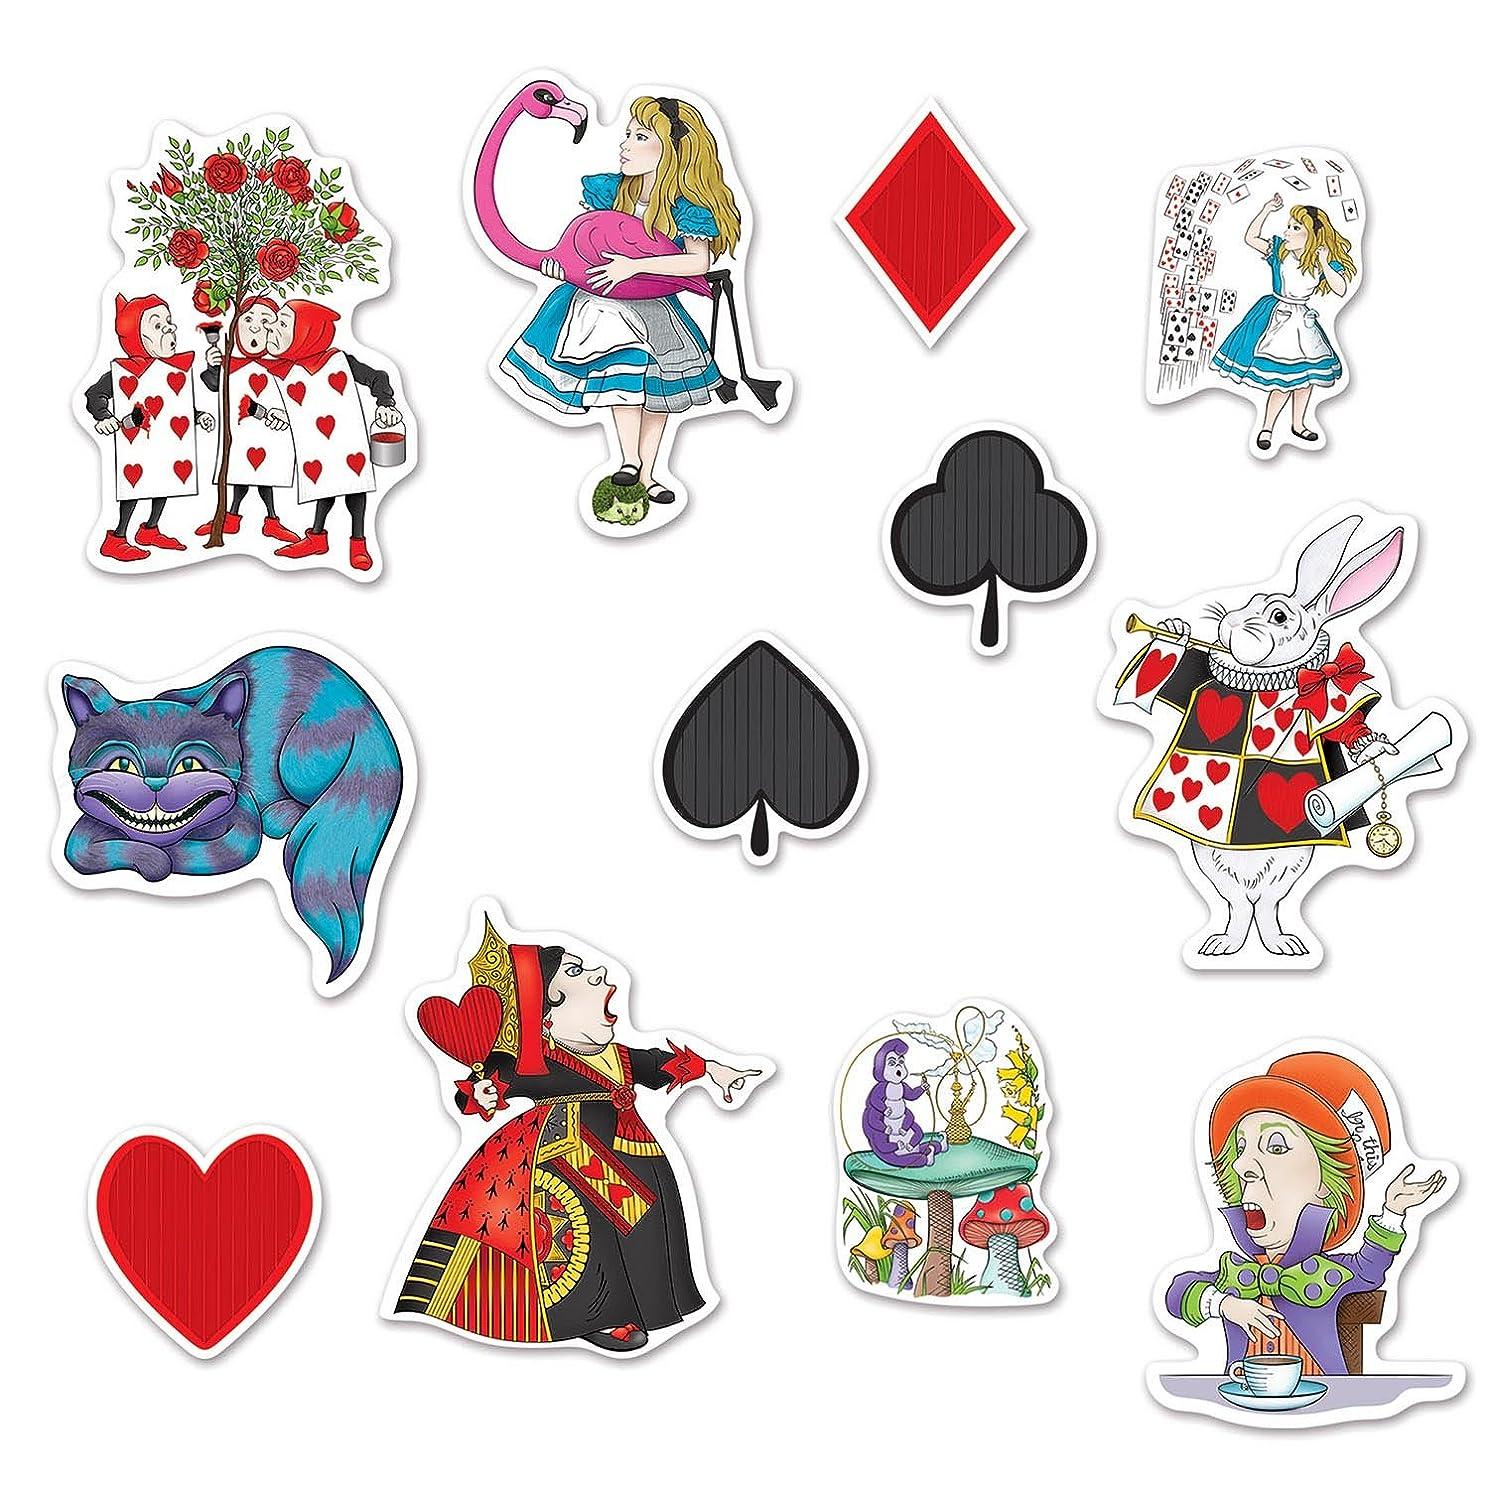 Beistle Alice in Wonderland Cutouts Multicolored 6